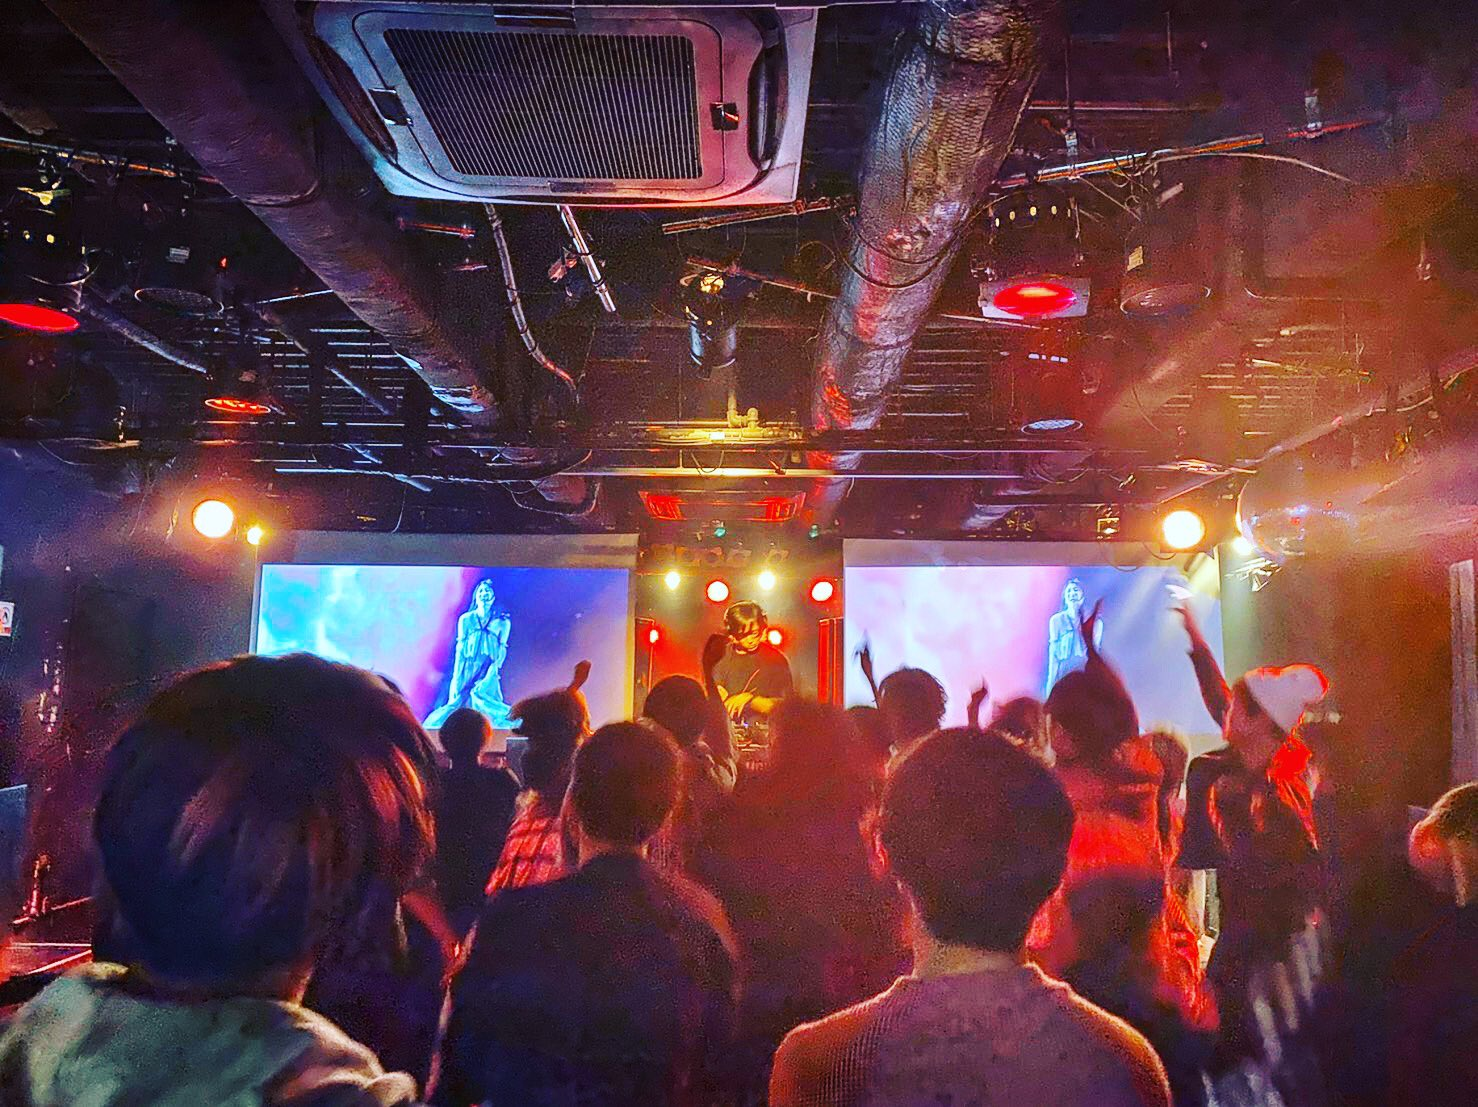 https://bar-rockaholic.jp/shibuya/blog/8FA4236C-B30A-4BDB-94C8-414621662099.jpeg